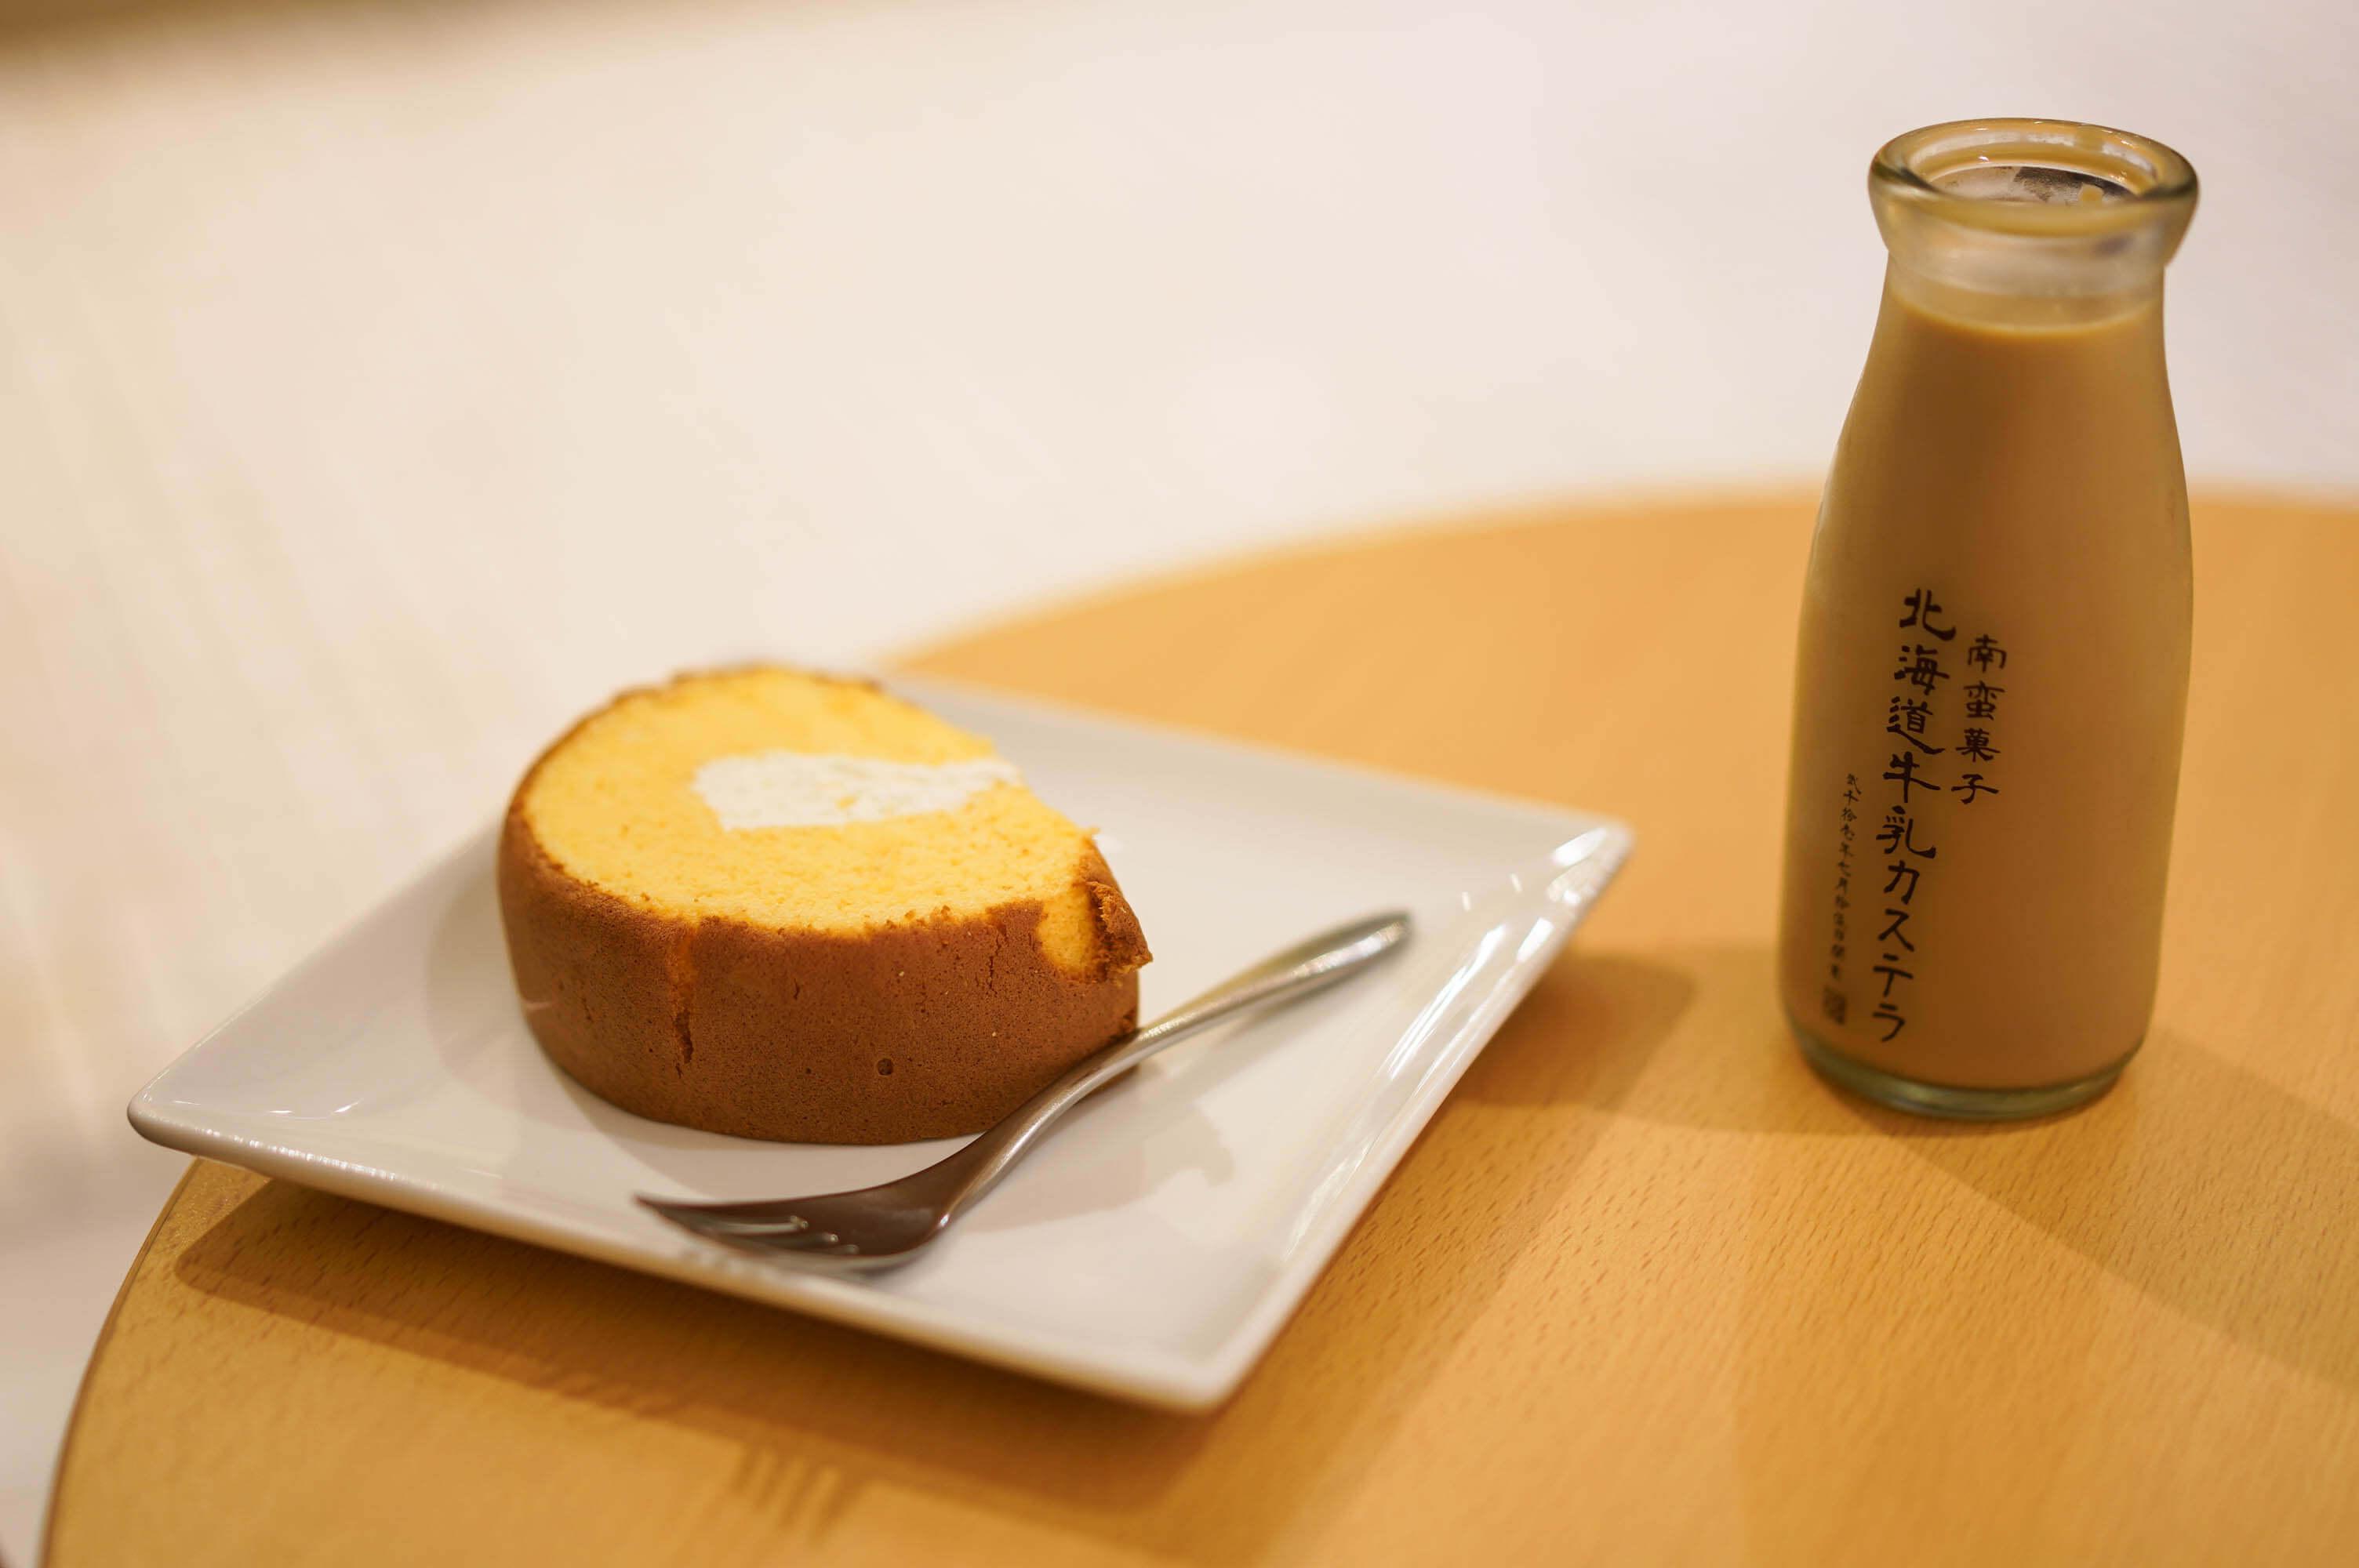 北海道新千歲機場北海道菓子カステラ